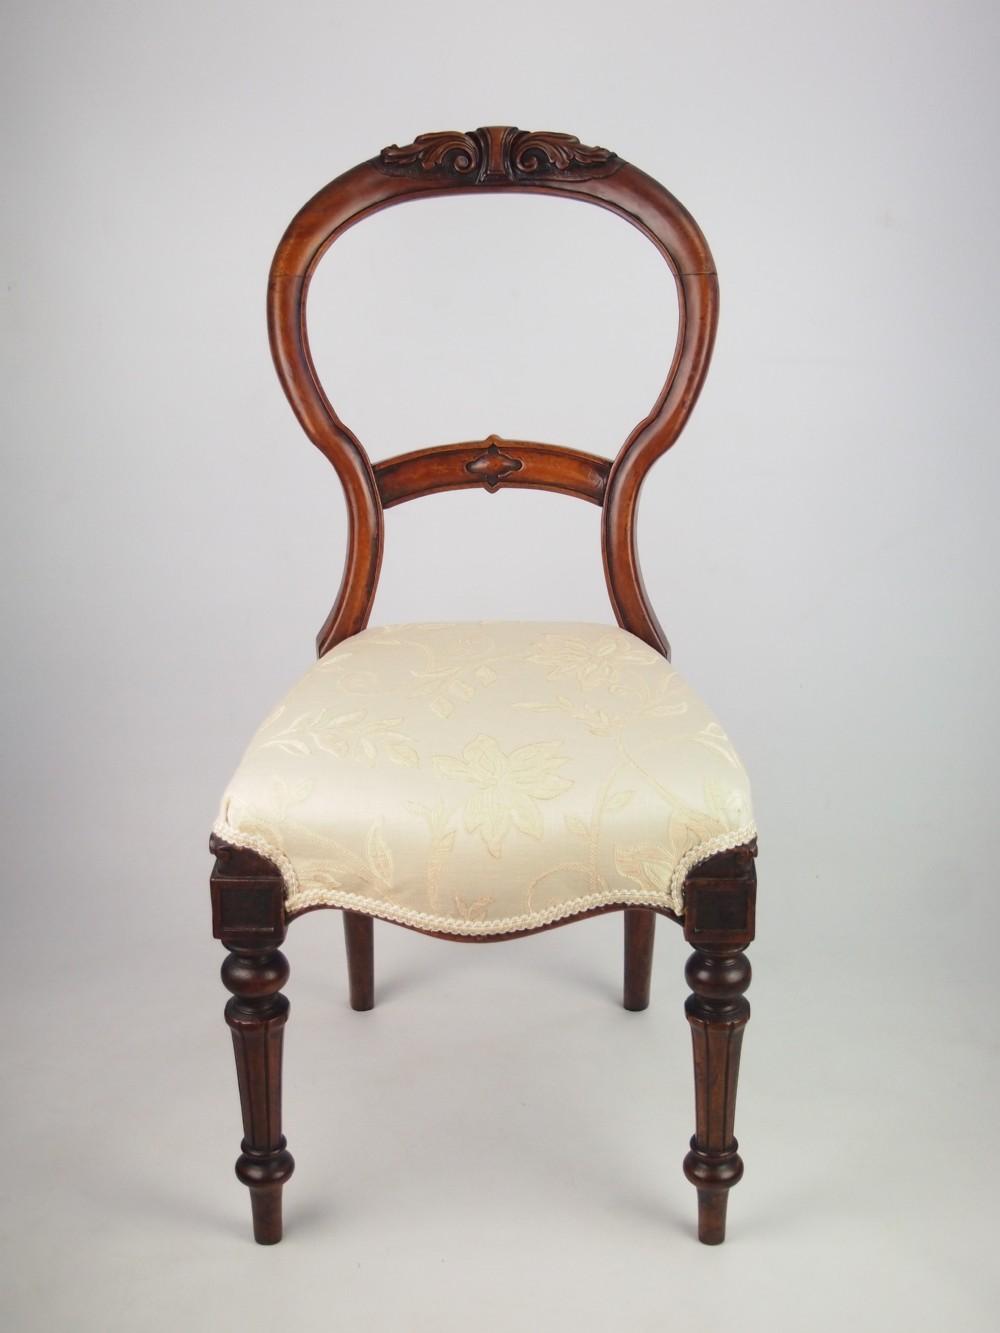 Antique Victorian Mahogany Balloon Back Chair 257225